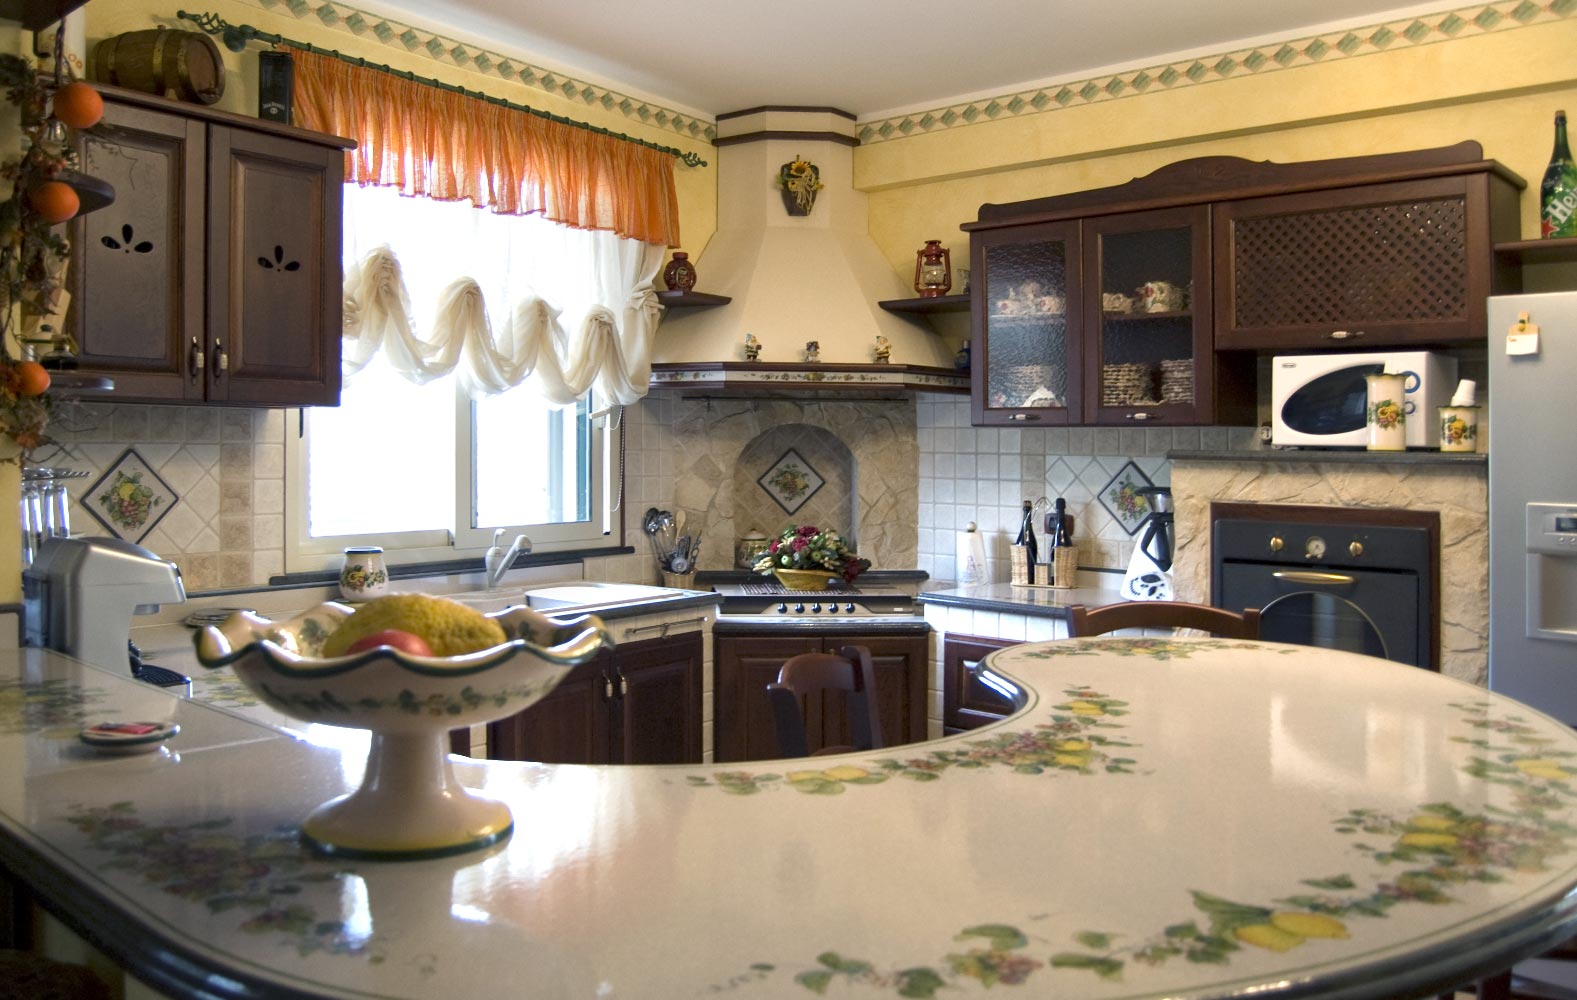 Cucine ecologiche cucine in finta muratura modello for Esempi di cucine in muratura